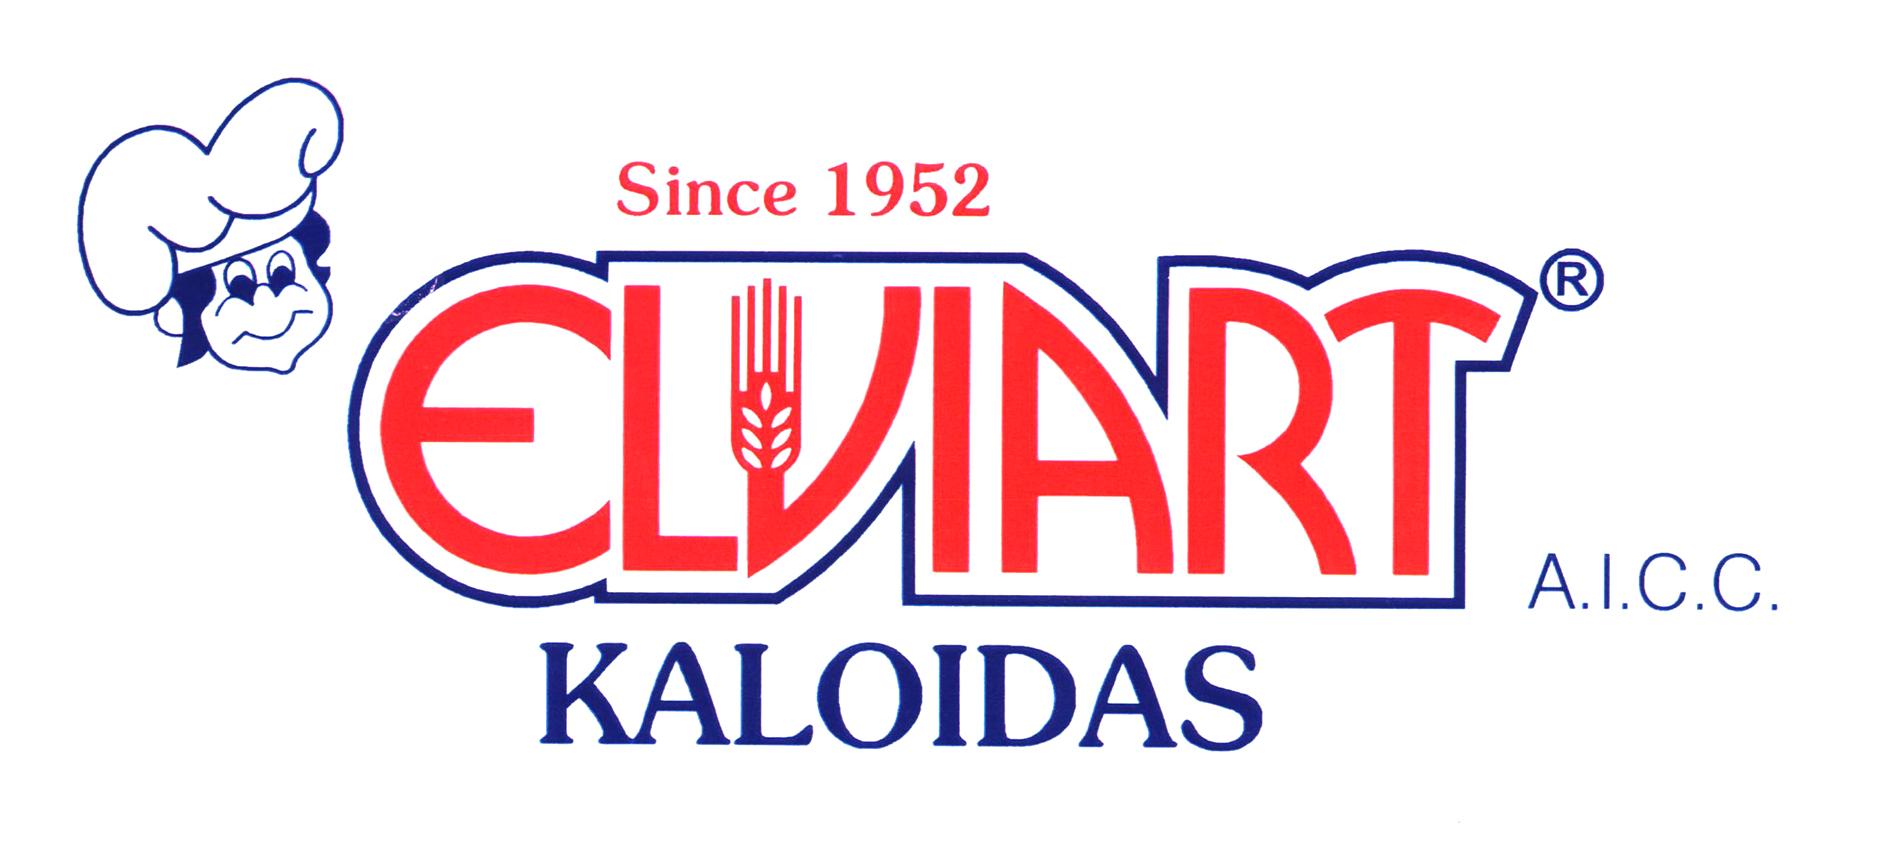 Since 1952 ELVIART A.I.C.C. KALOIDAS